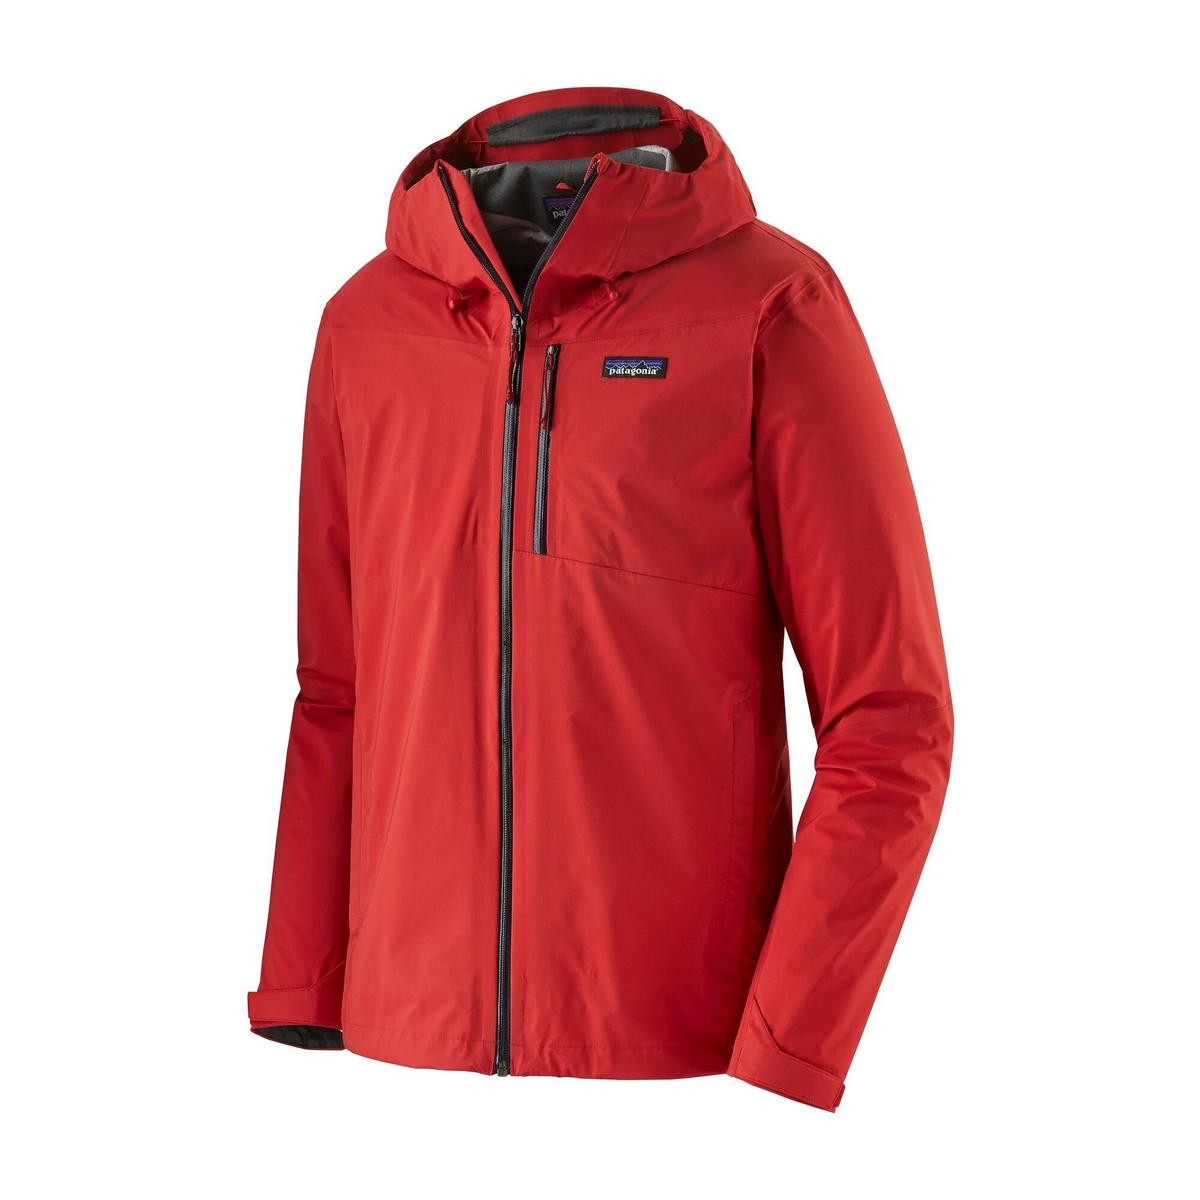 Patagonia Men's Patagonia Rainshadow 3l Waterproof Jacket - Red